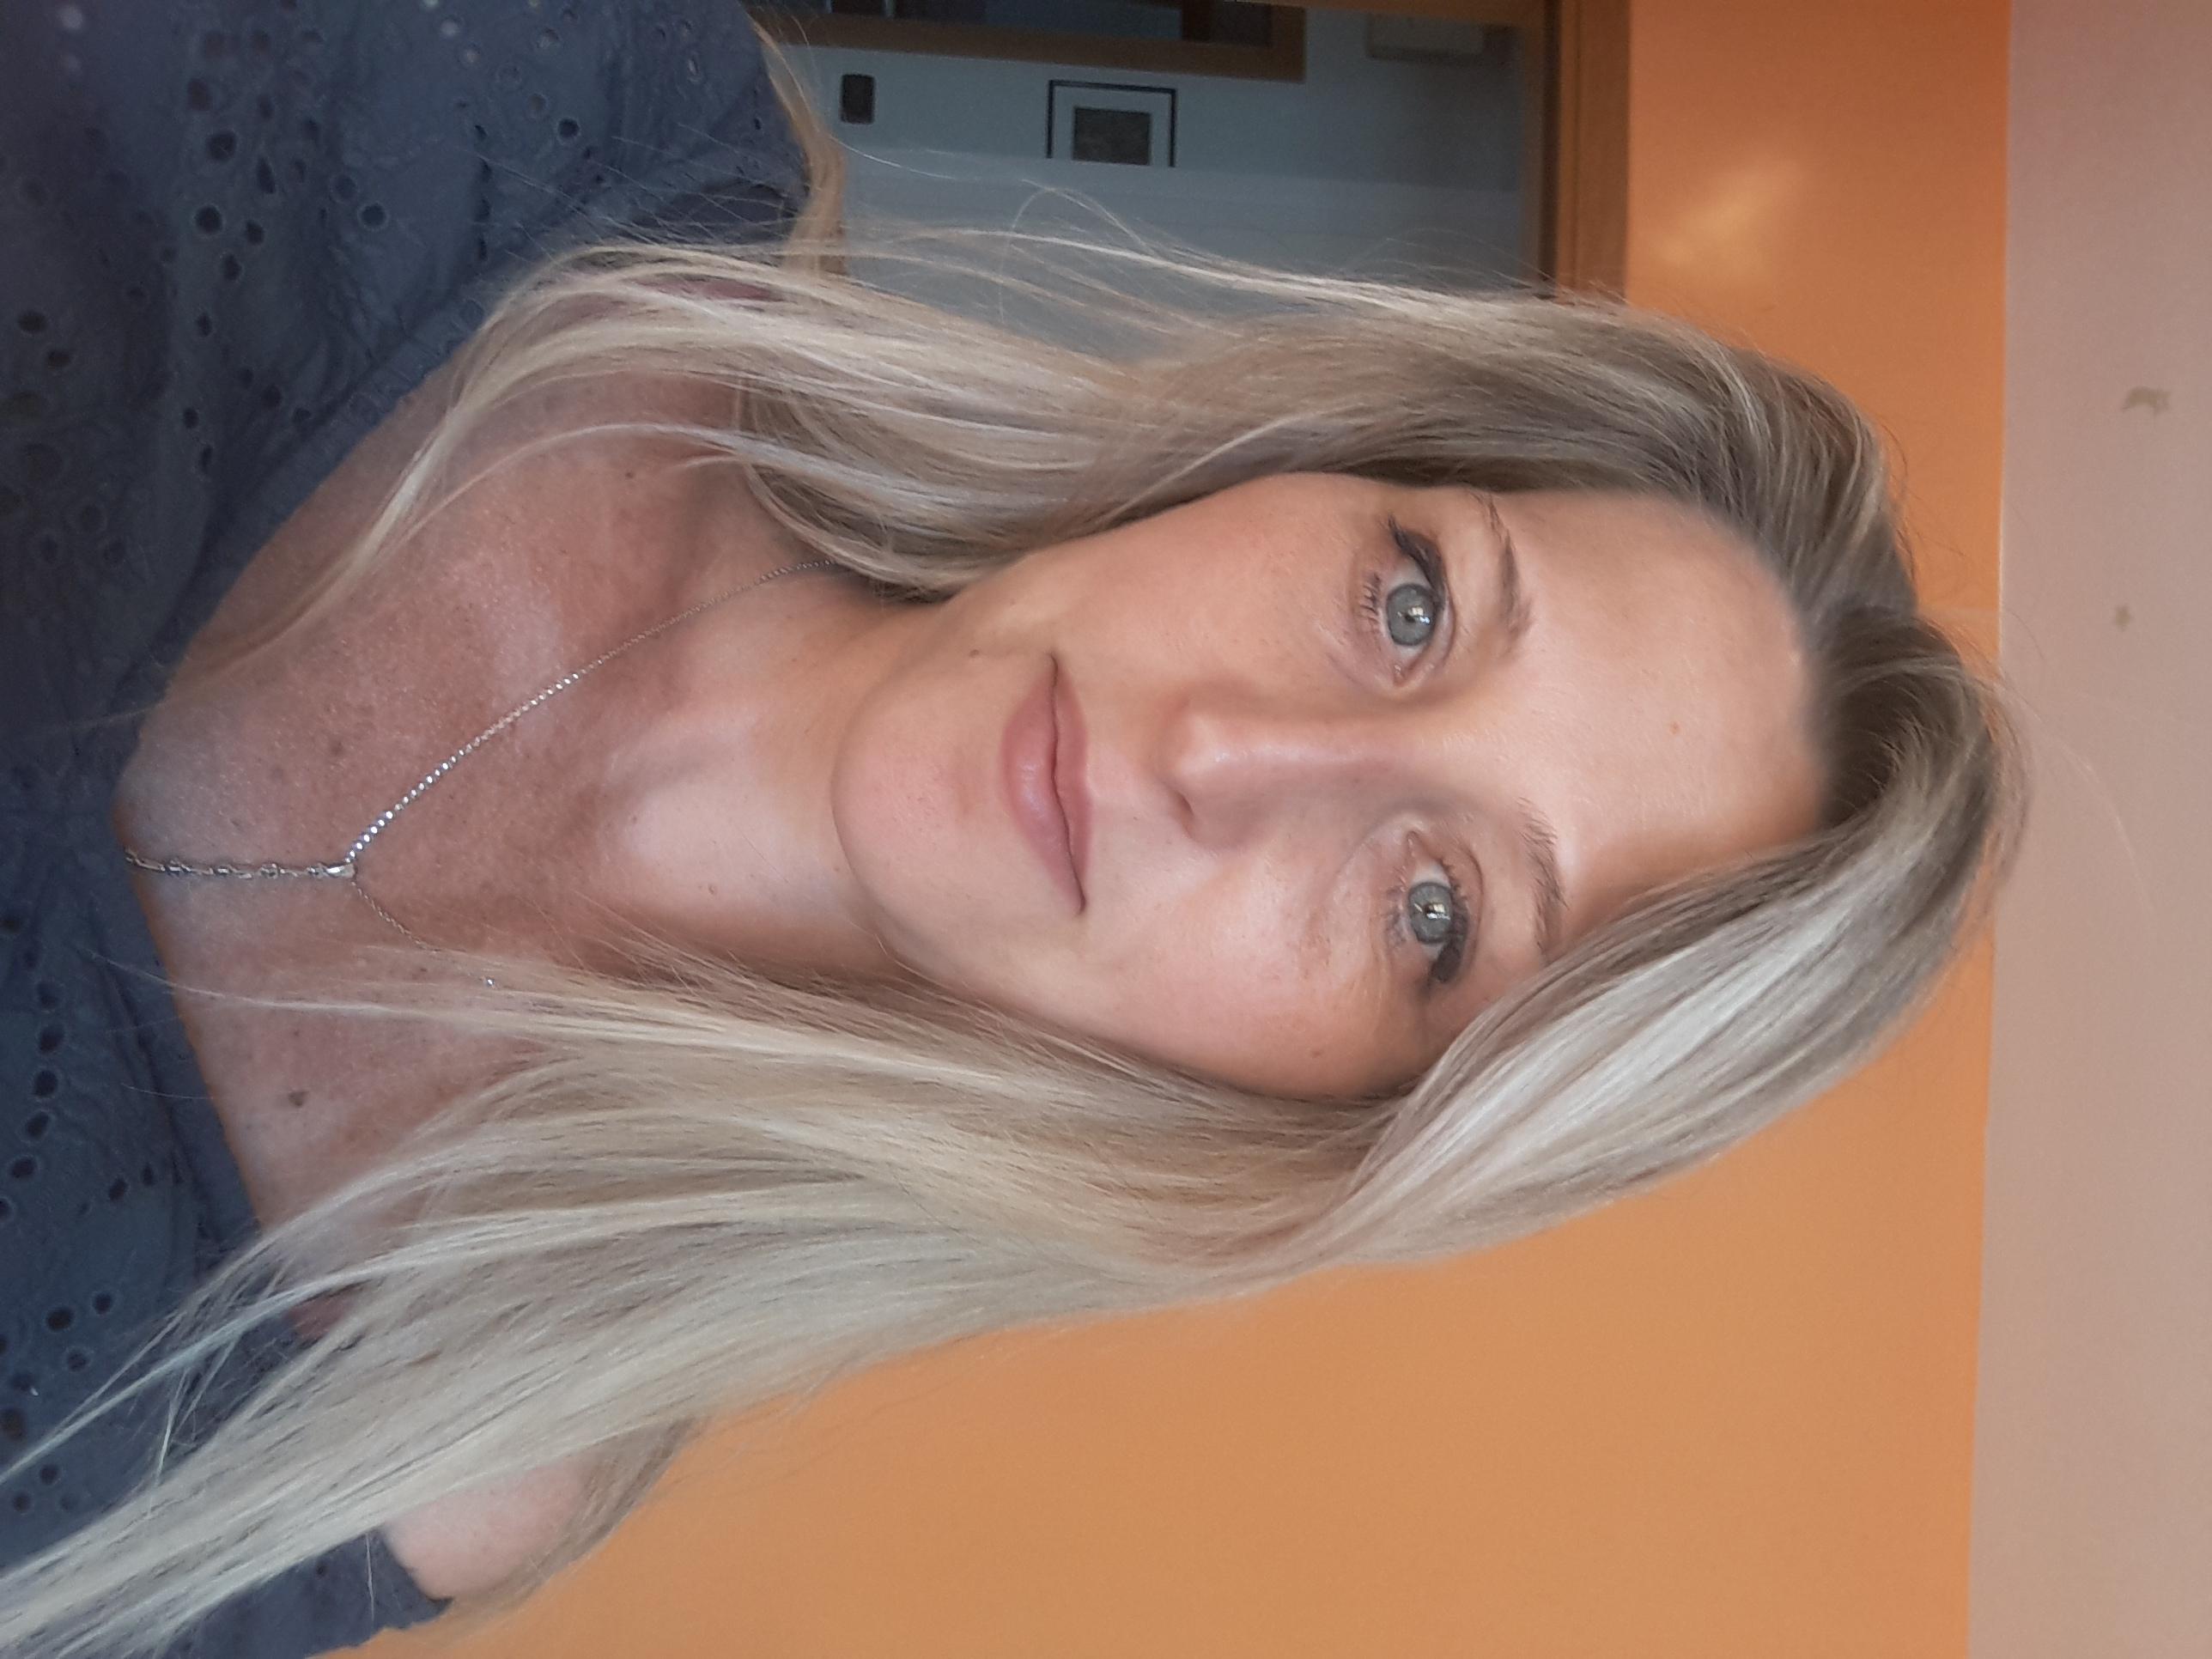 Andreatta Chiara